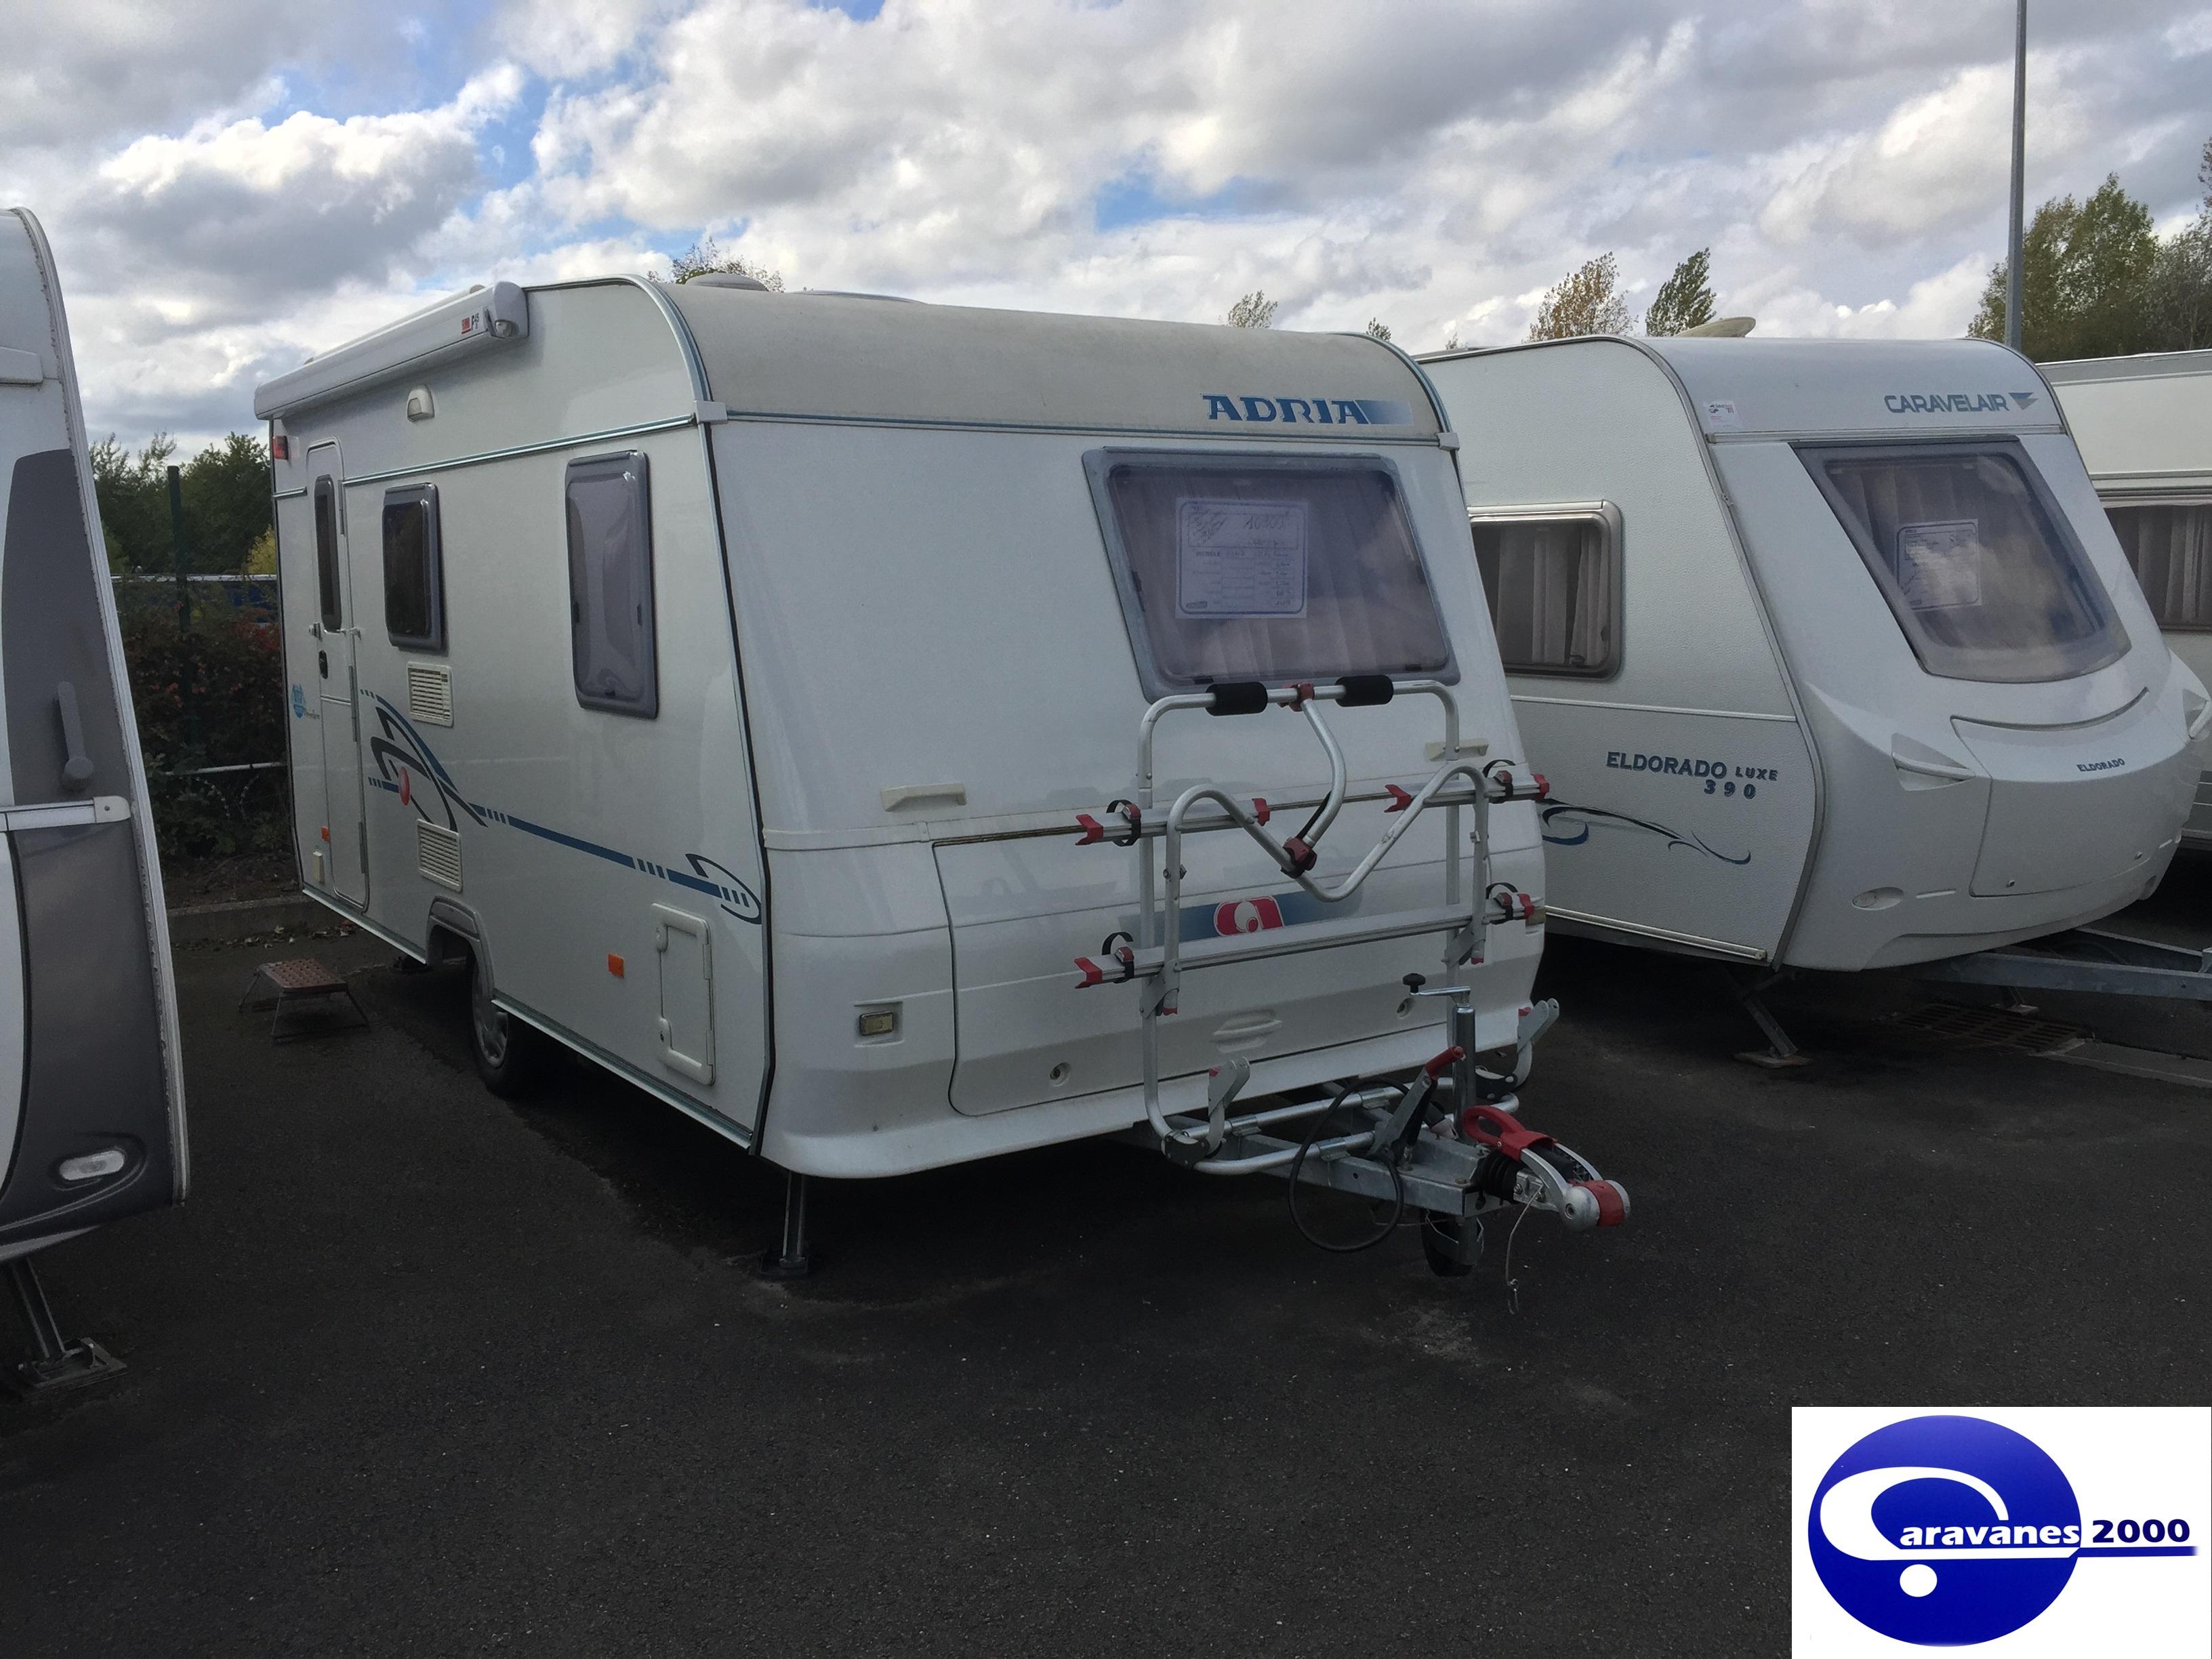 adria 432 px occasion caravane vendre en loiret 45 ref 12952 net campers. Black Bedroom Furniture Sets. Home Design Ideas